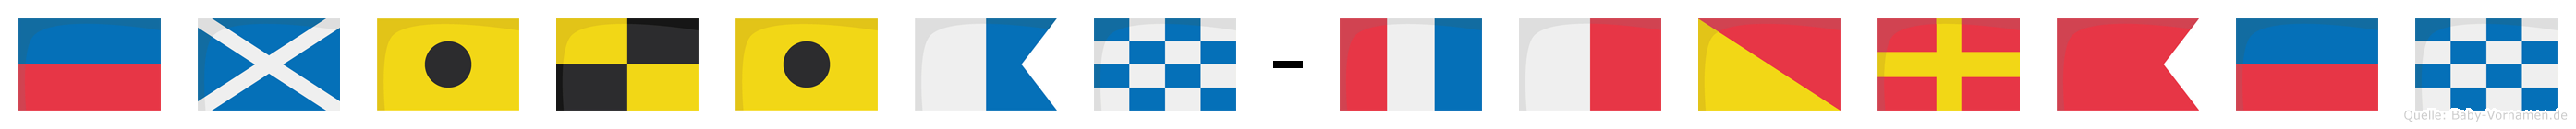 Emilian-Thorben im Flaggenalphabet